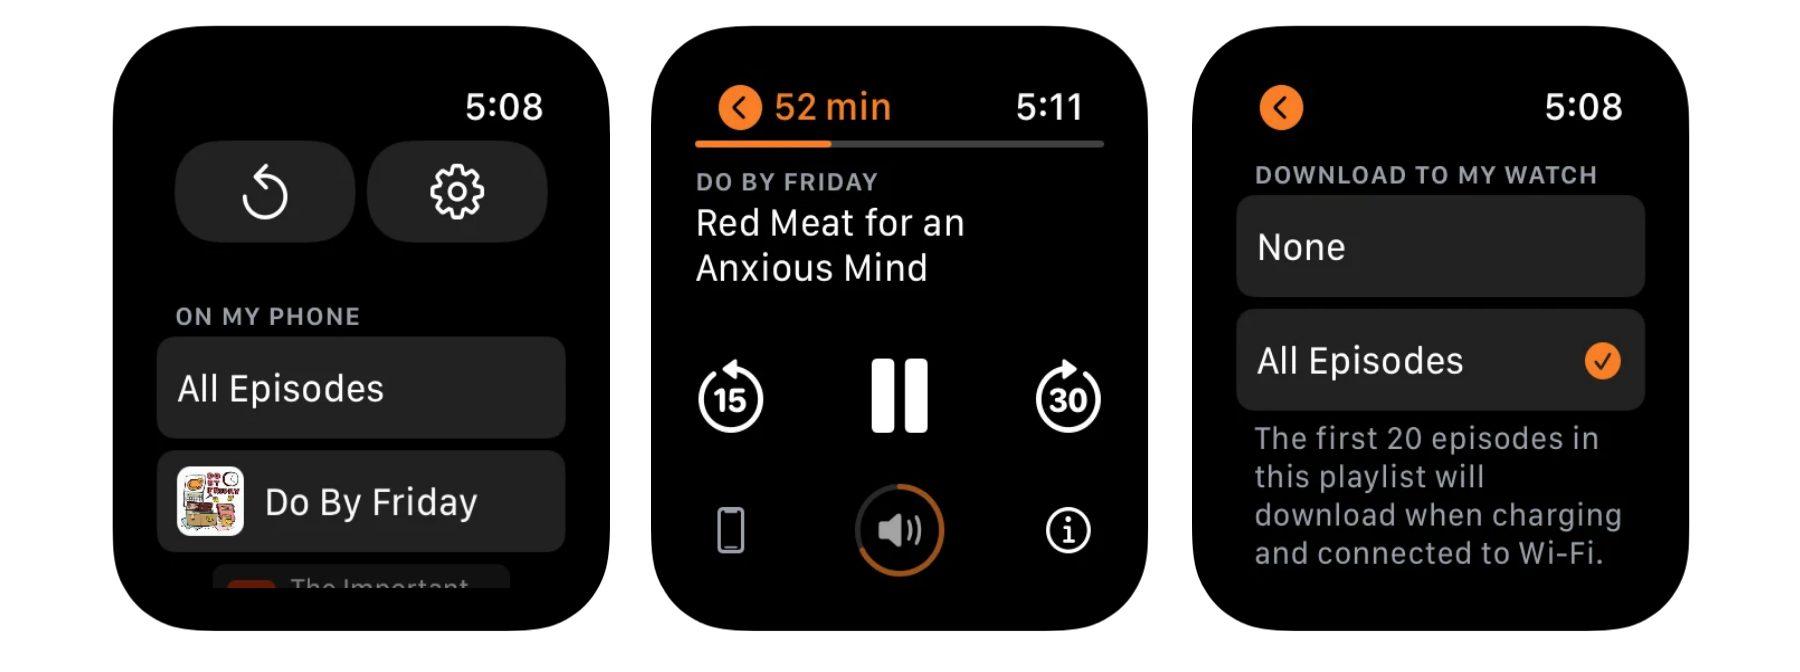 Apple Watch Overcast app